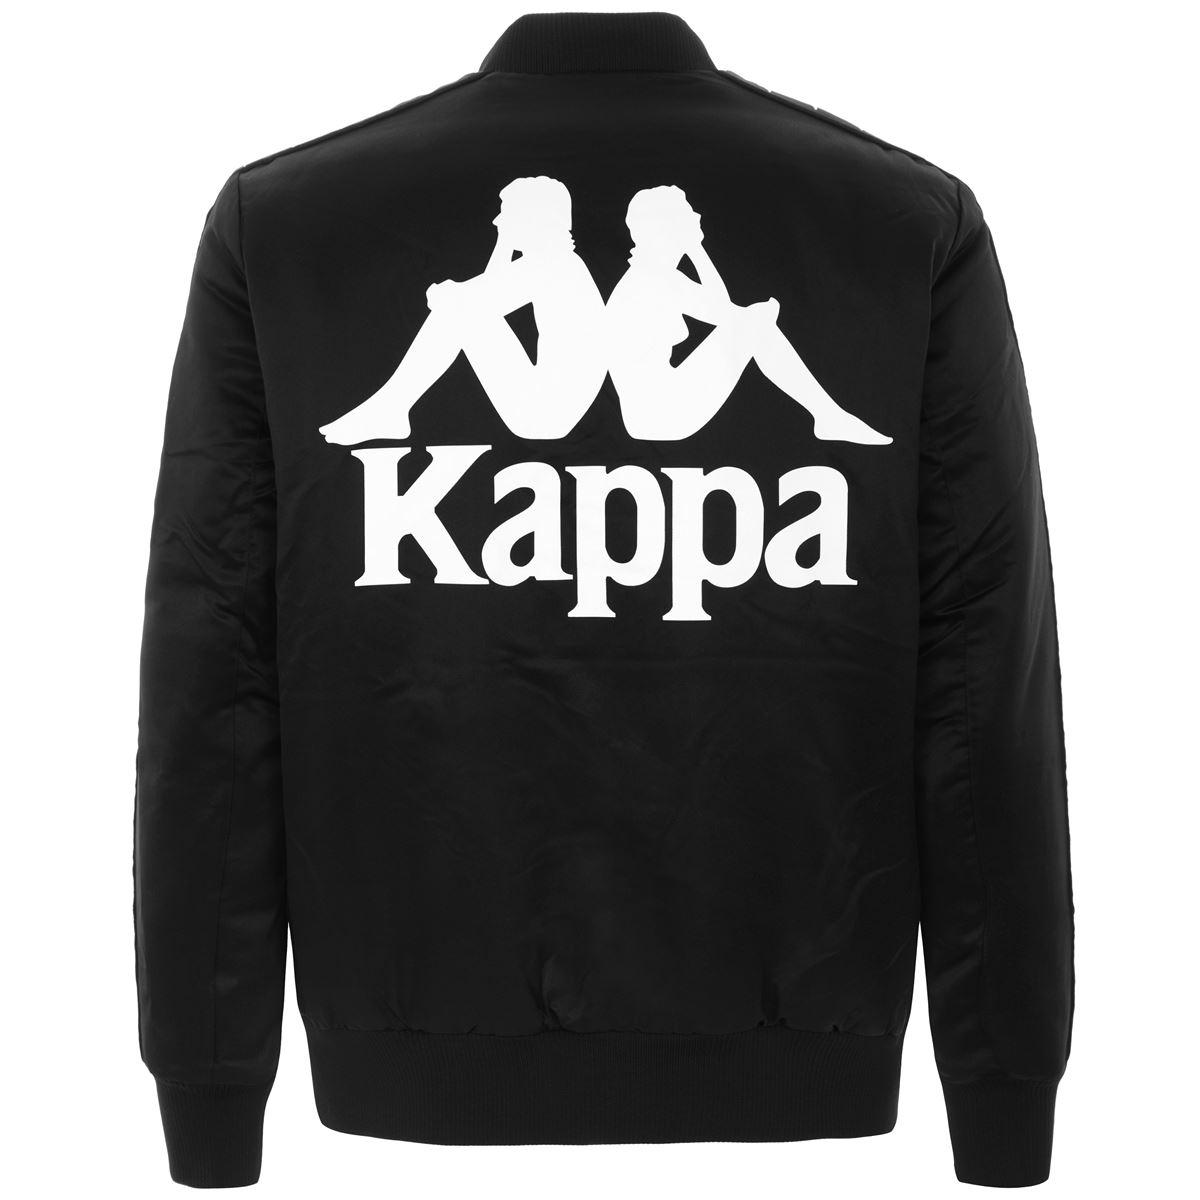 Kappa      304RMA0BY7 BLACK-WHITE